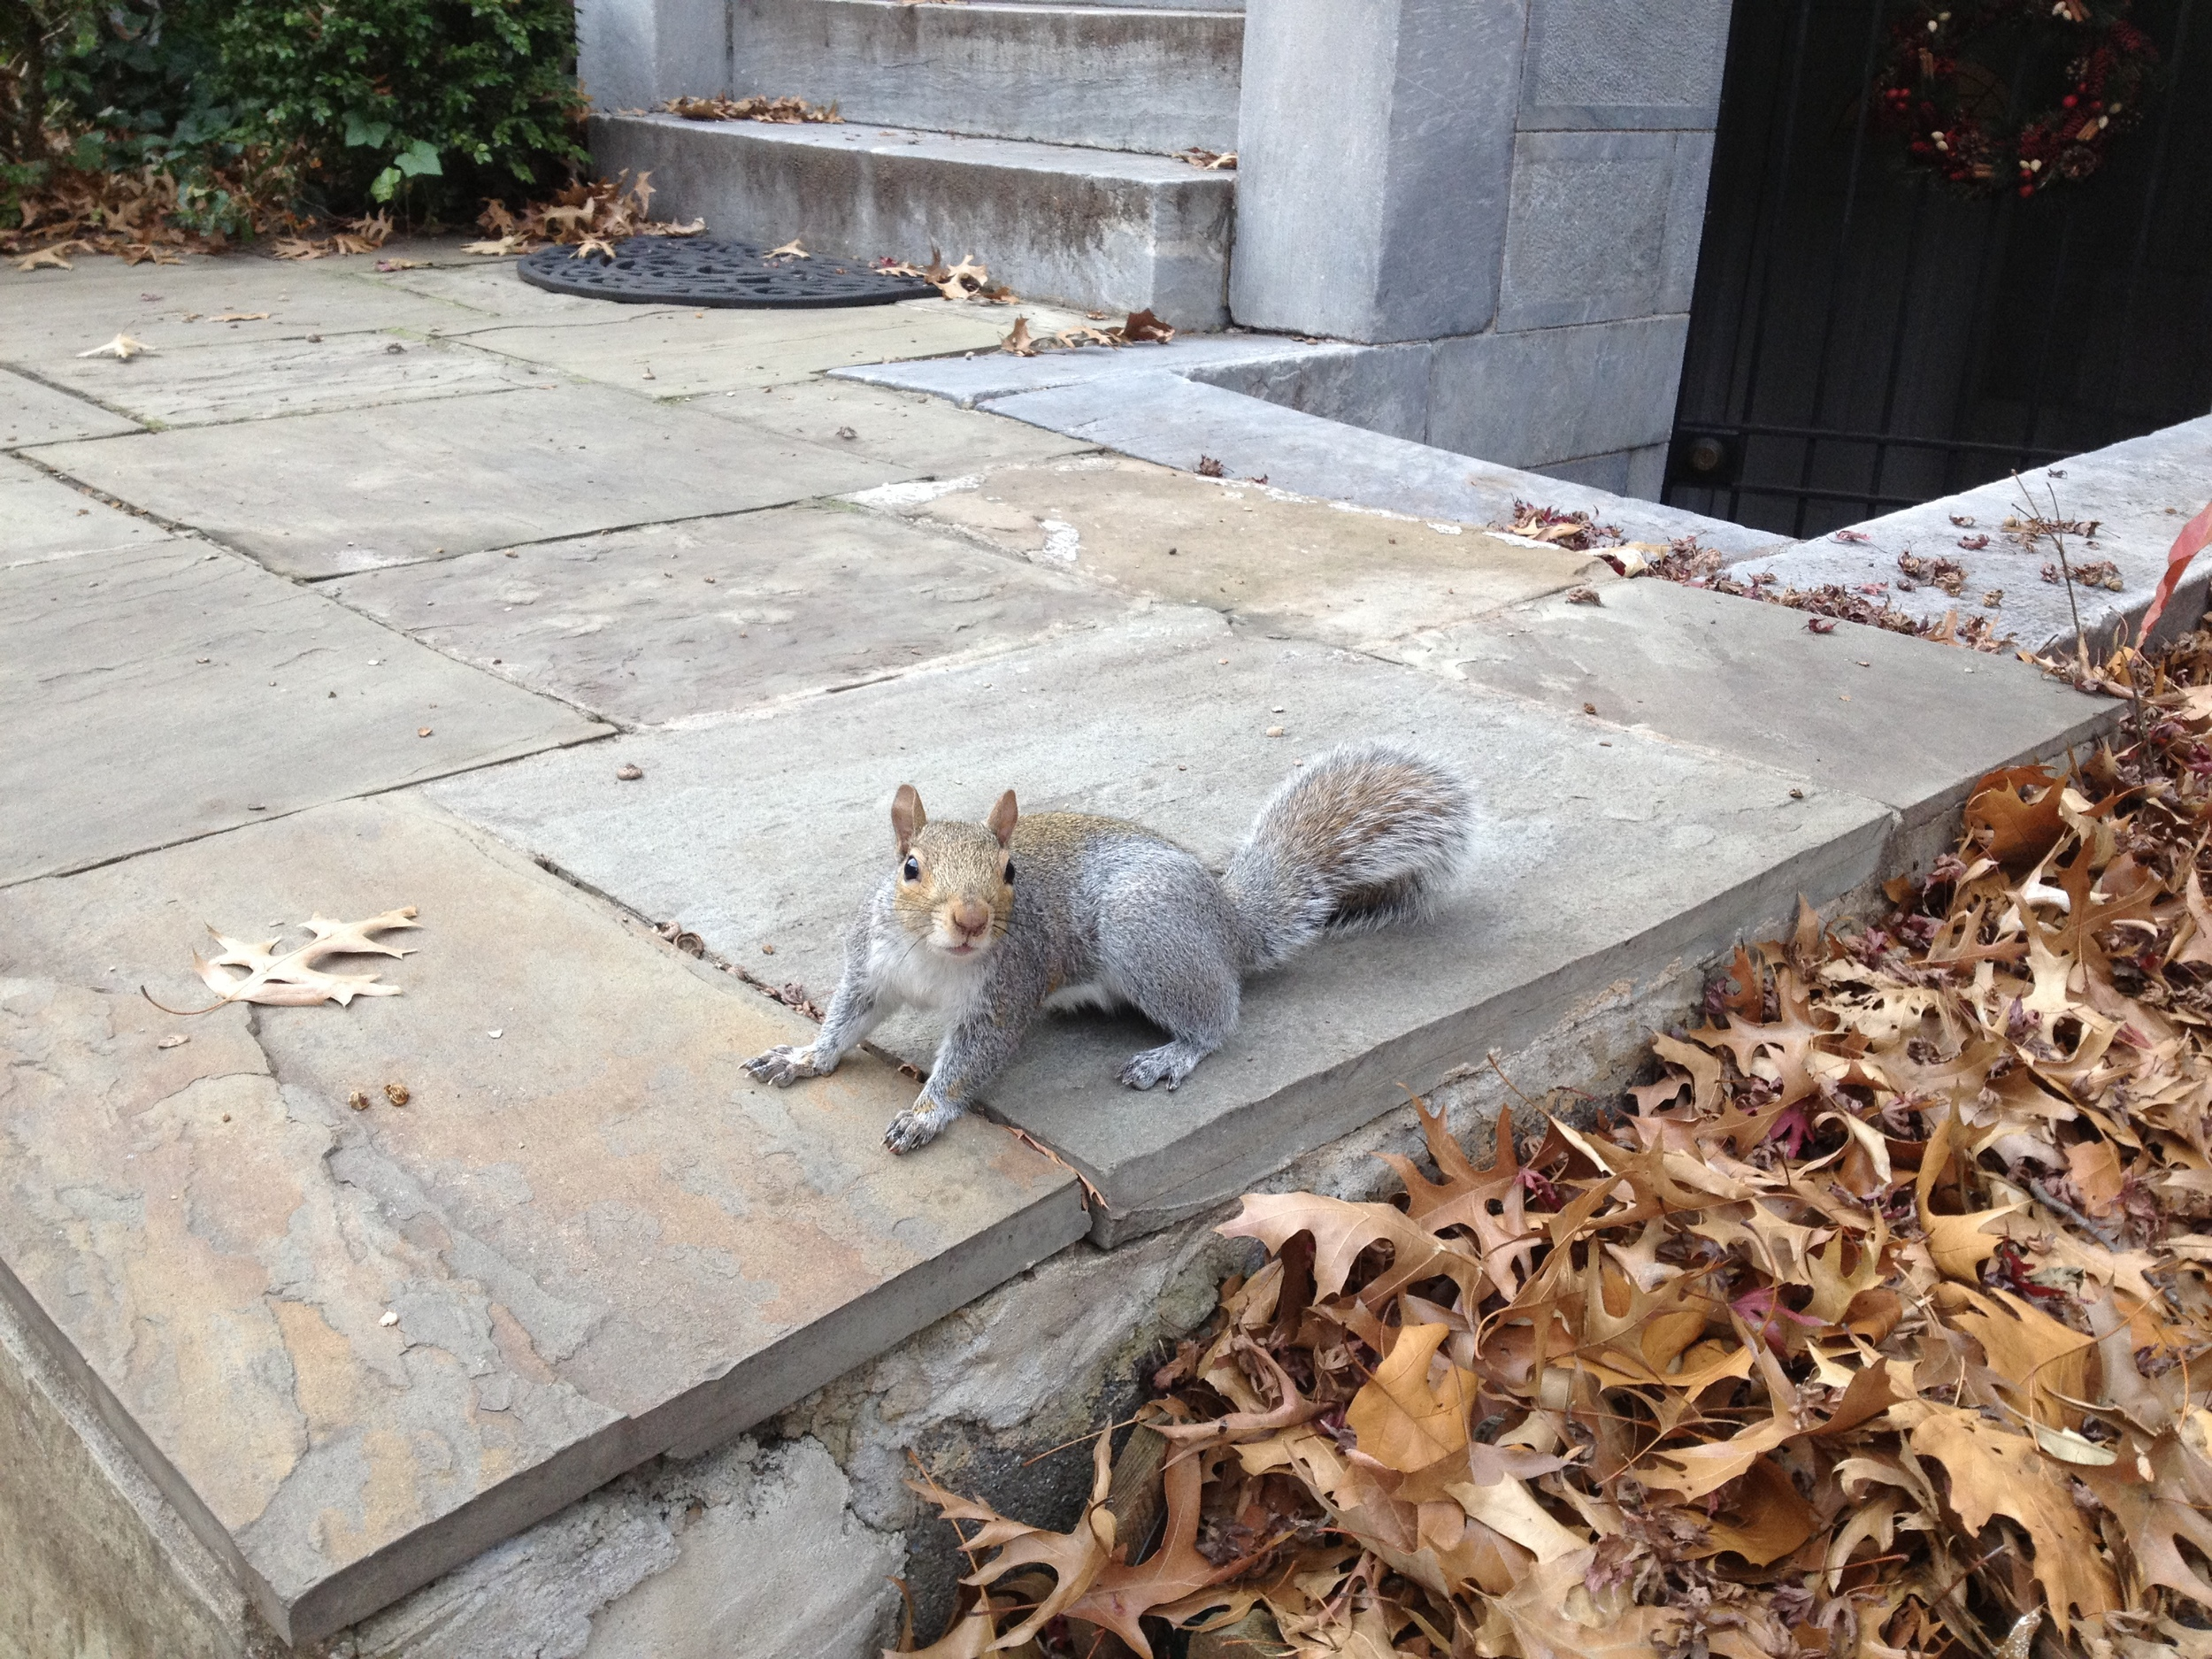 Squirrel buddy, Washington DC, 12-12-12, iPhone no zoom